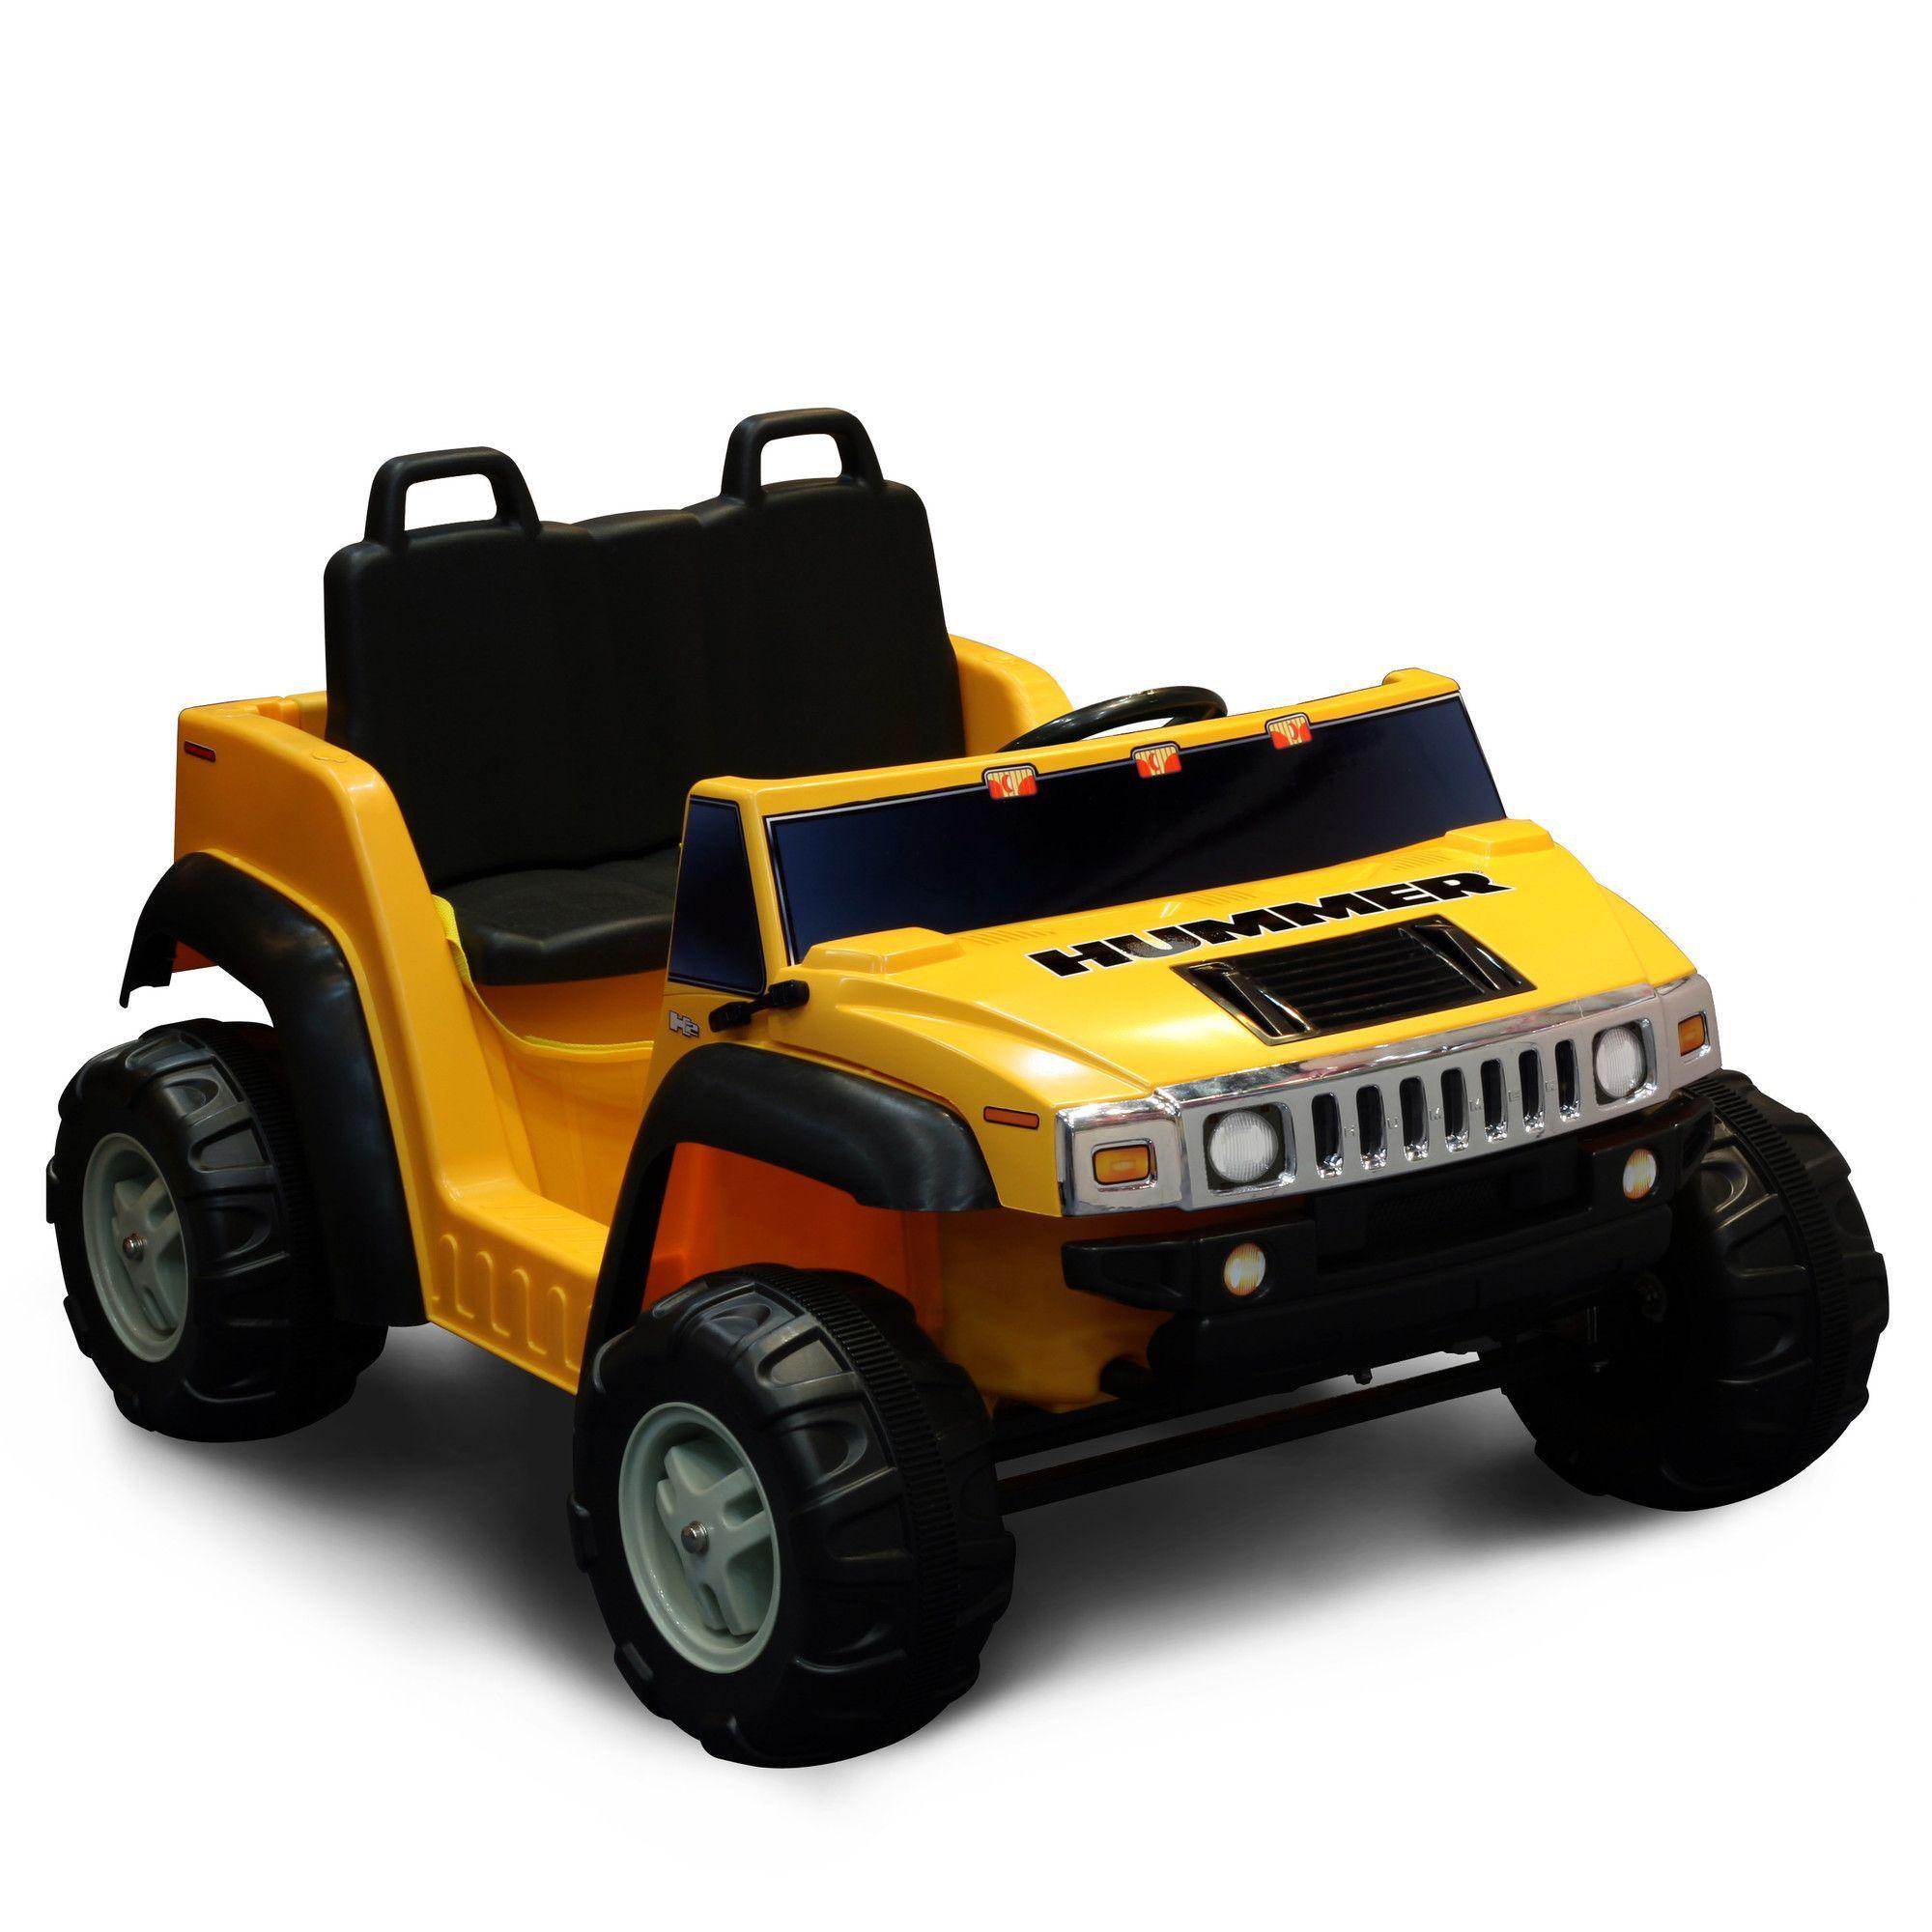 Hummer H2 12v Battery Powered Jeep Hummer H2 Hummer Ride On Toys